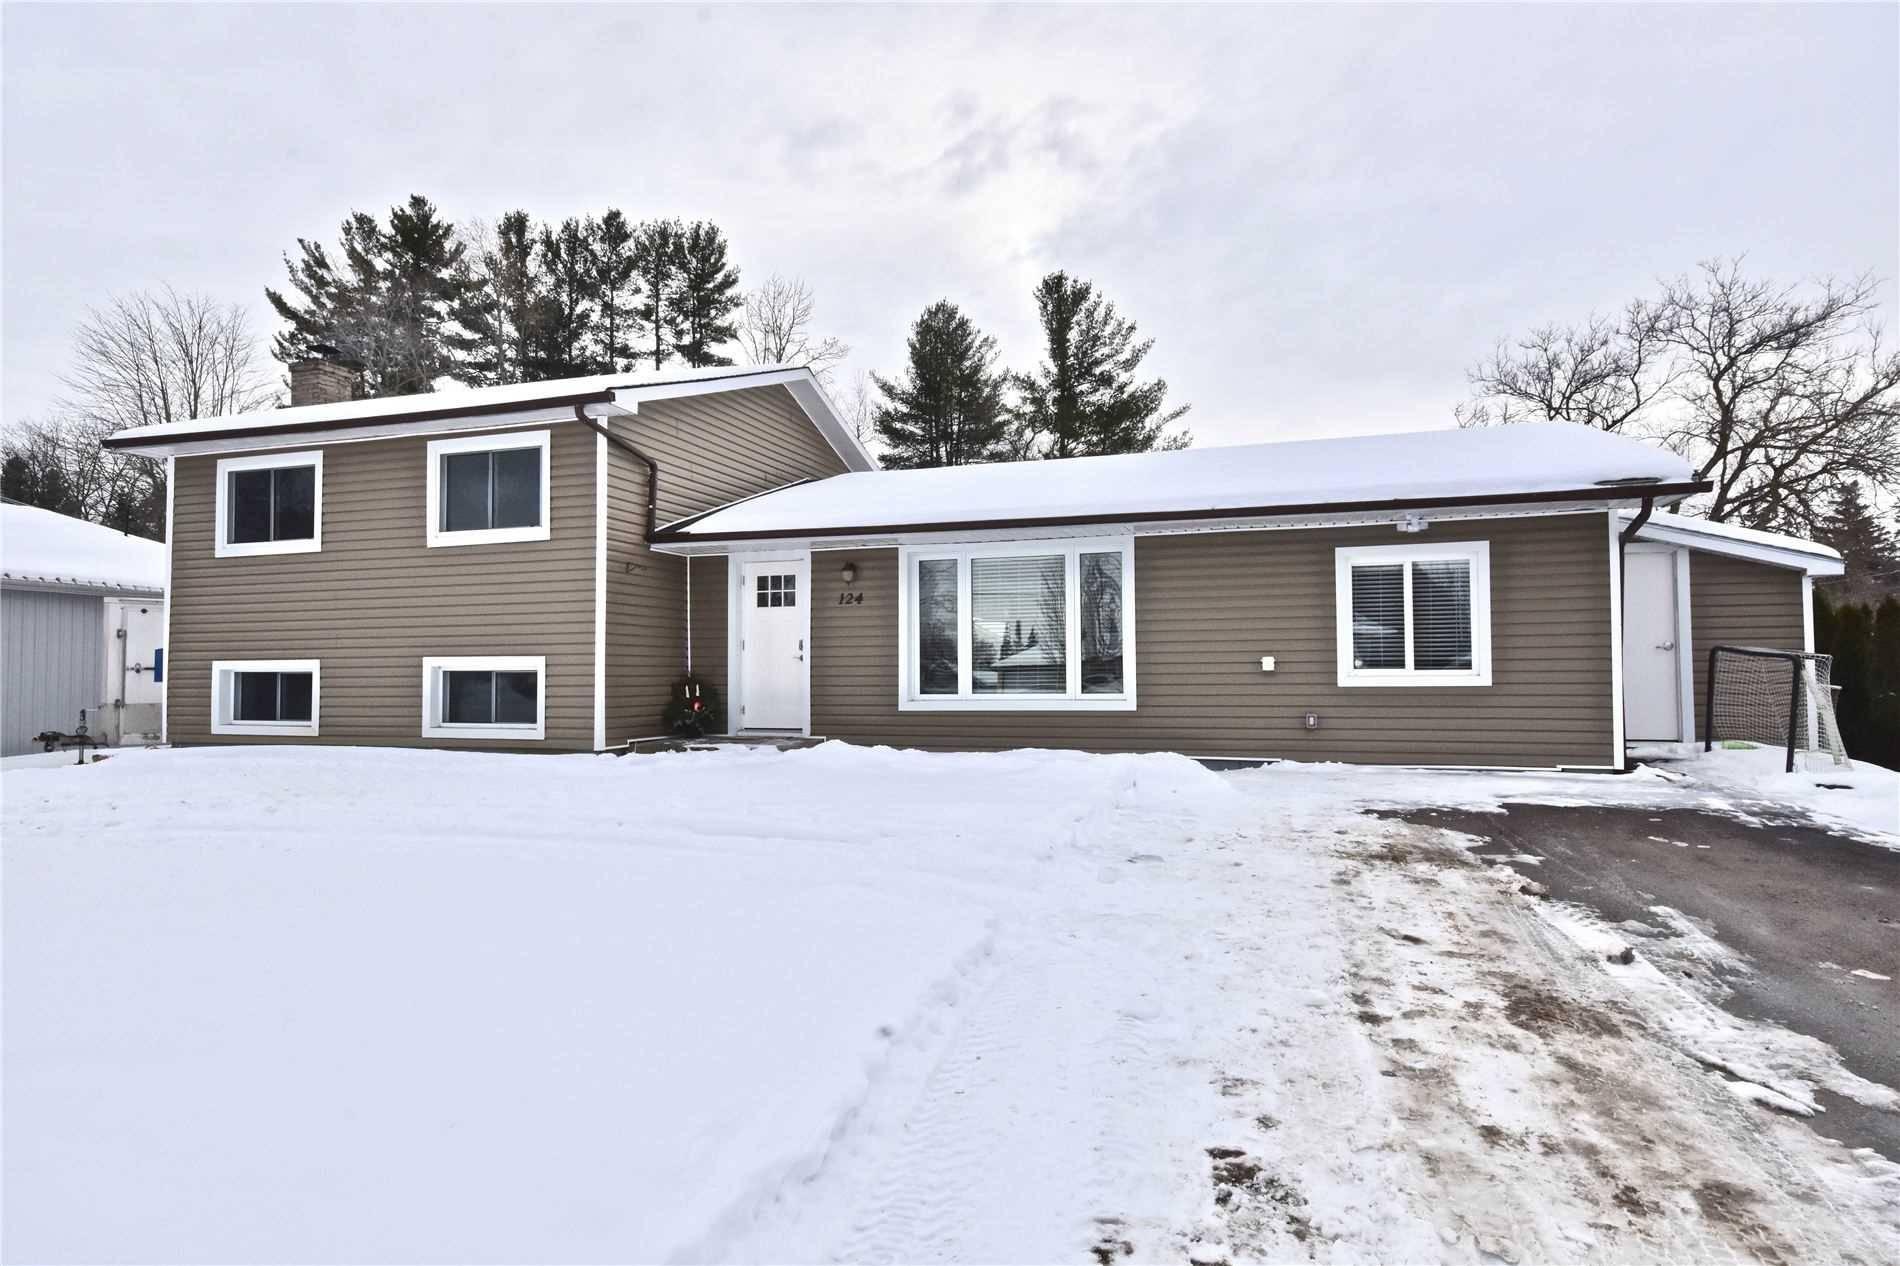 House for sale at 124 Sydenham St Essa Ontario - MLS: N4689999